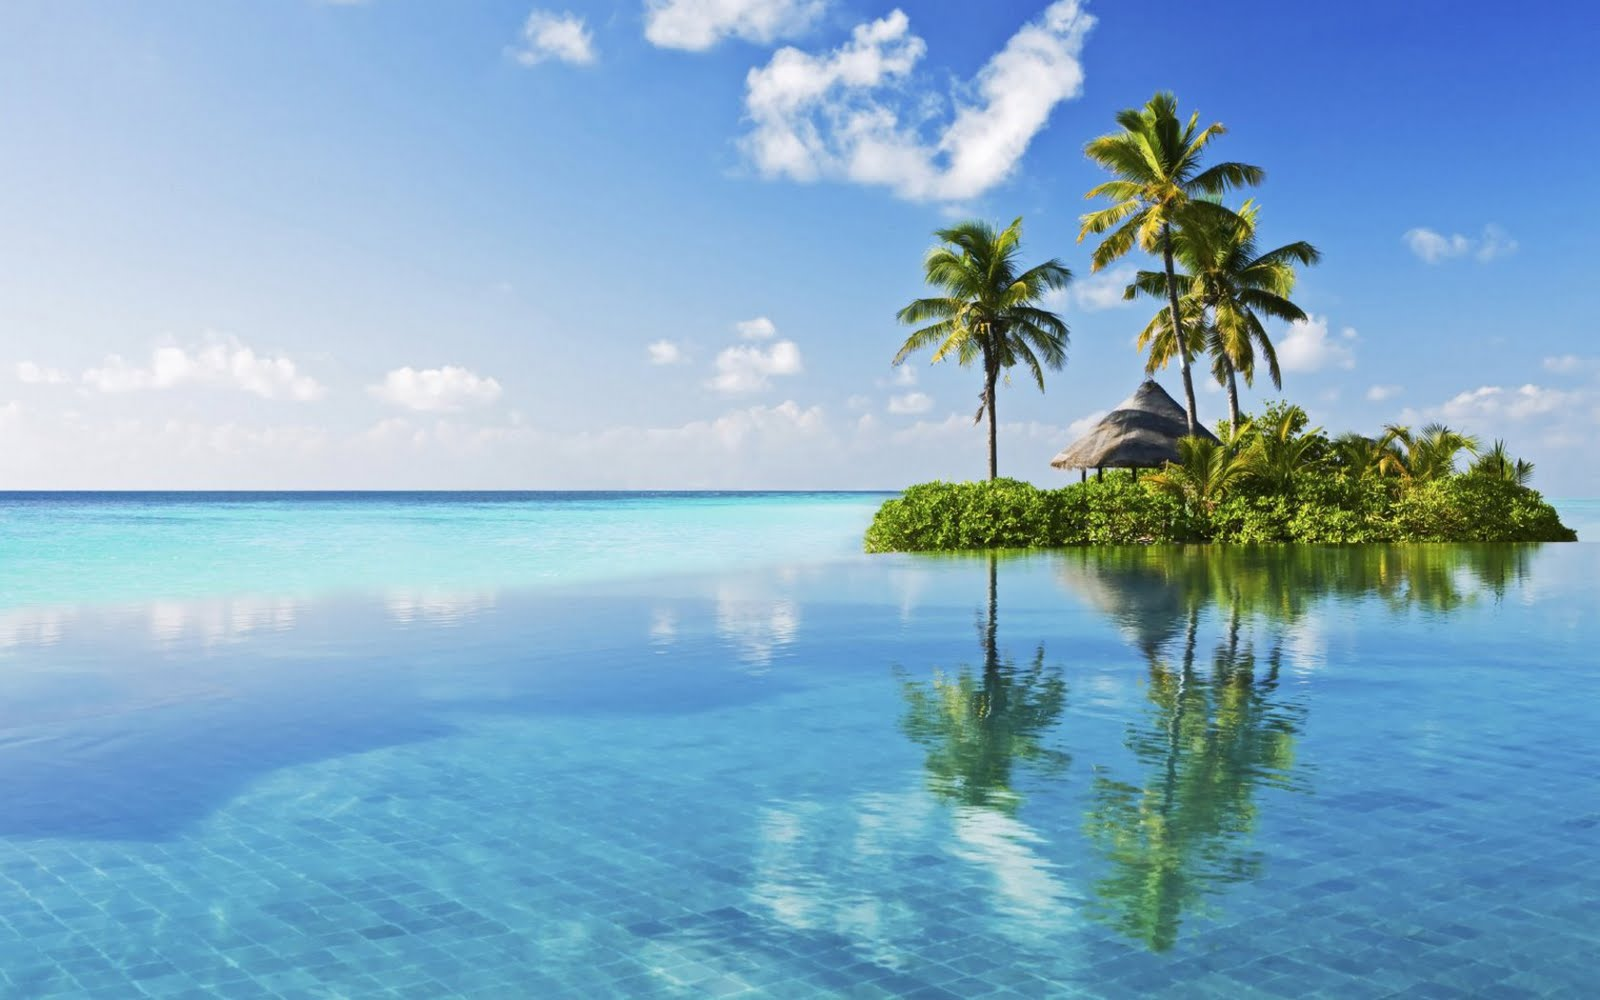 Beach palm trees wallpapers wallpapersafari - Free palm tree screensavers ...